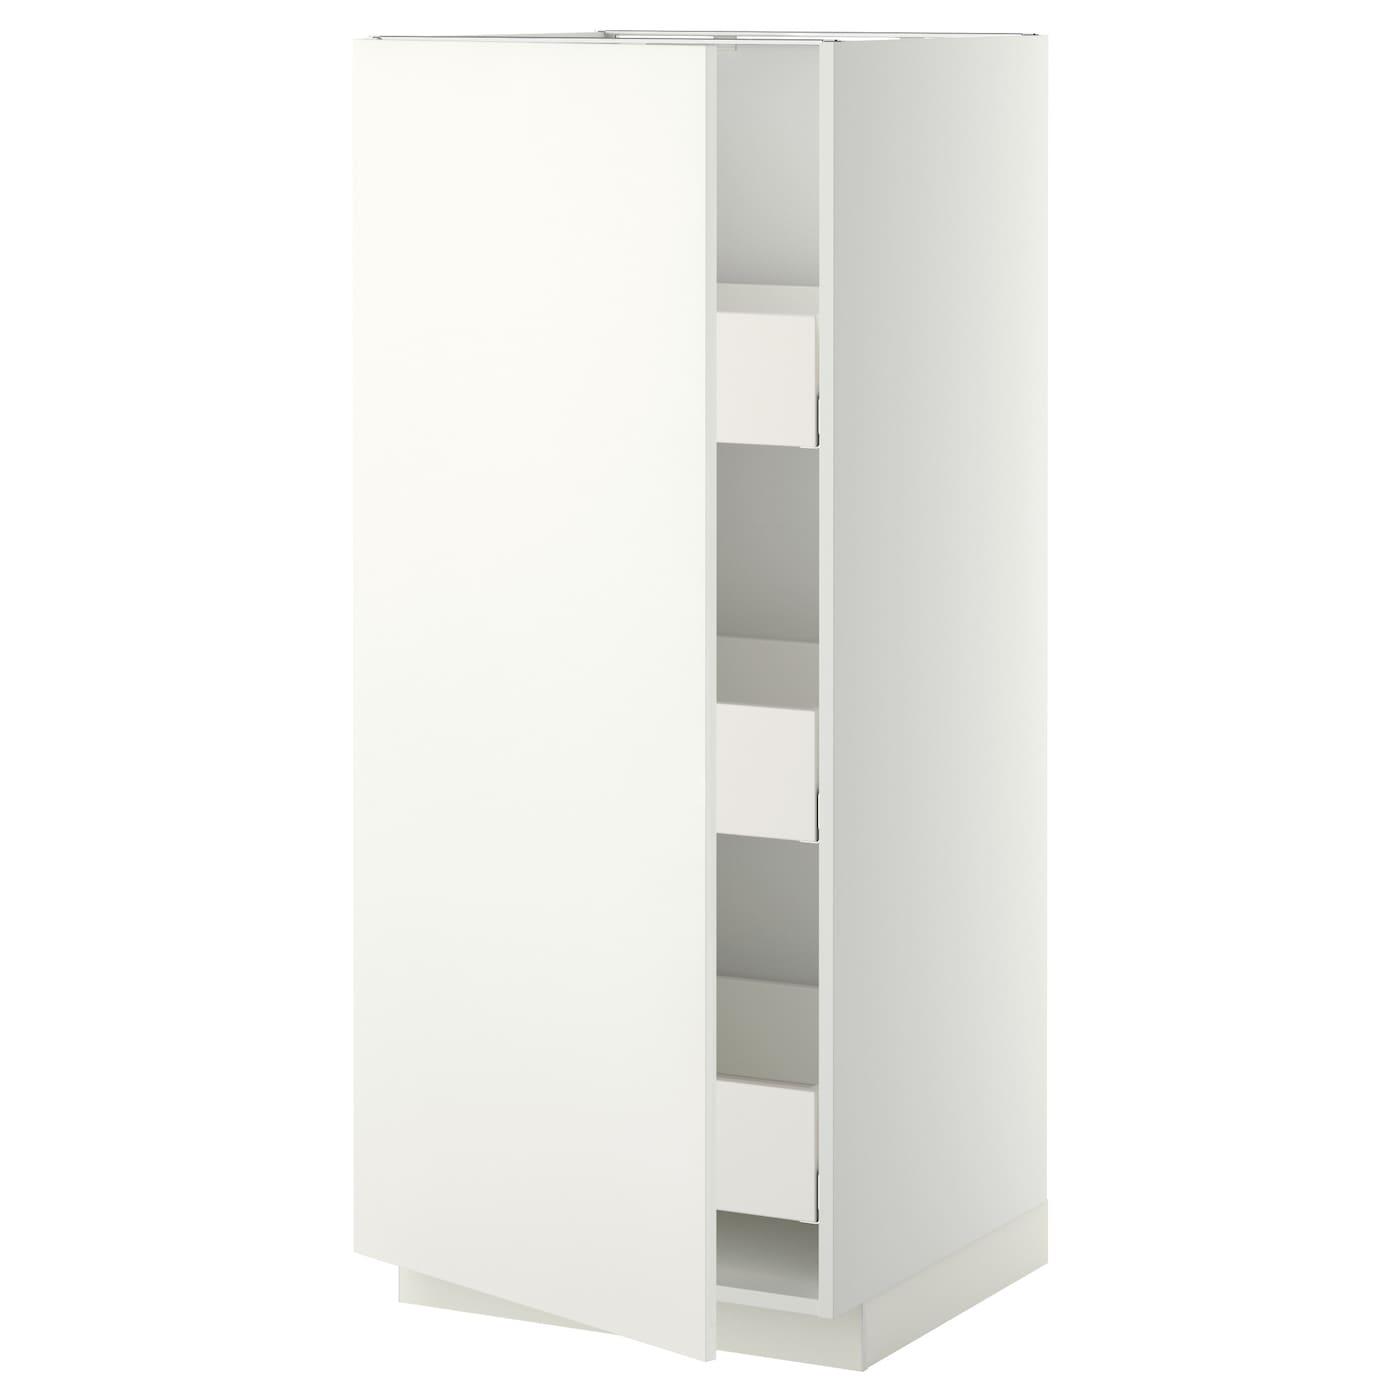 metod maximera l ment armoire avec tiroirs blanc h ggeby blanc 60x60x140 cm ikea. Black Bedroom Furniture Sets. Home Design Ideas